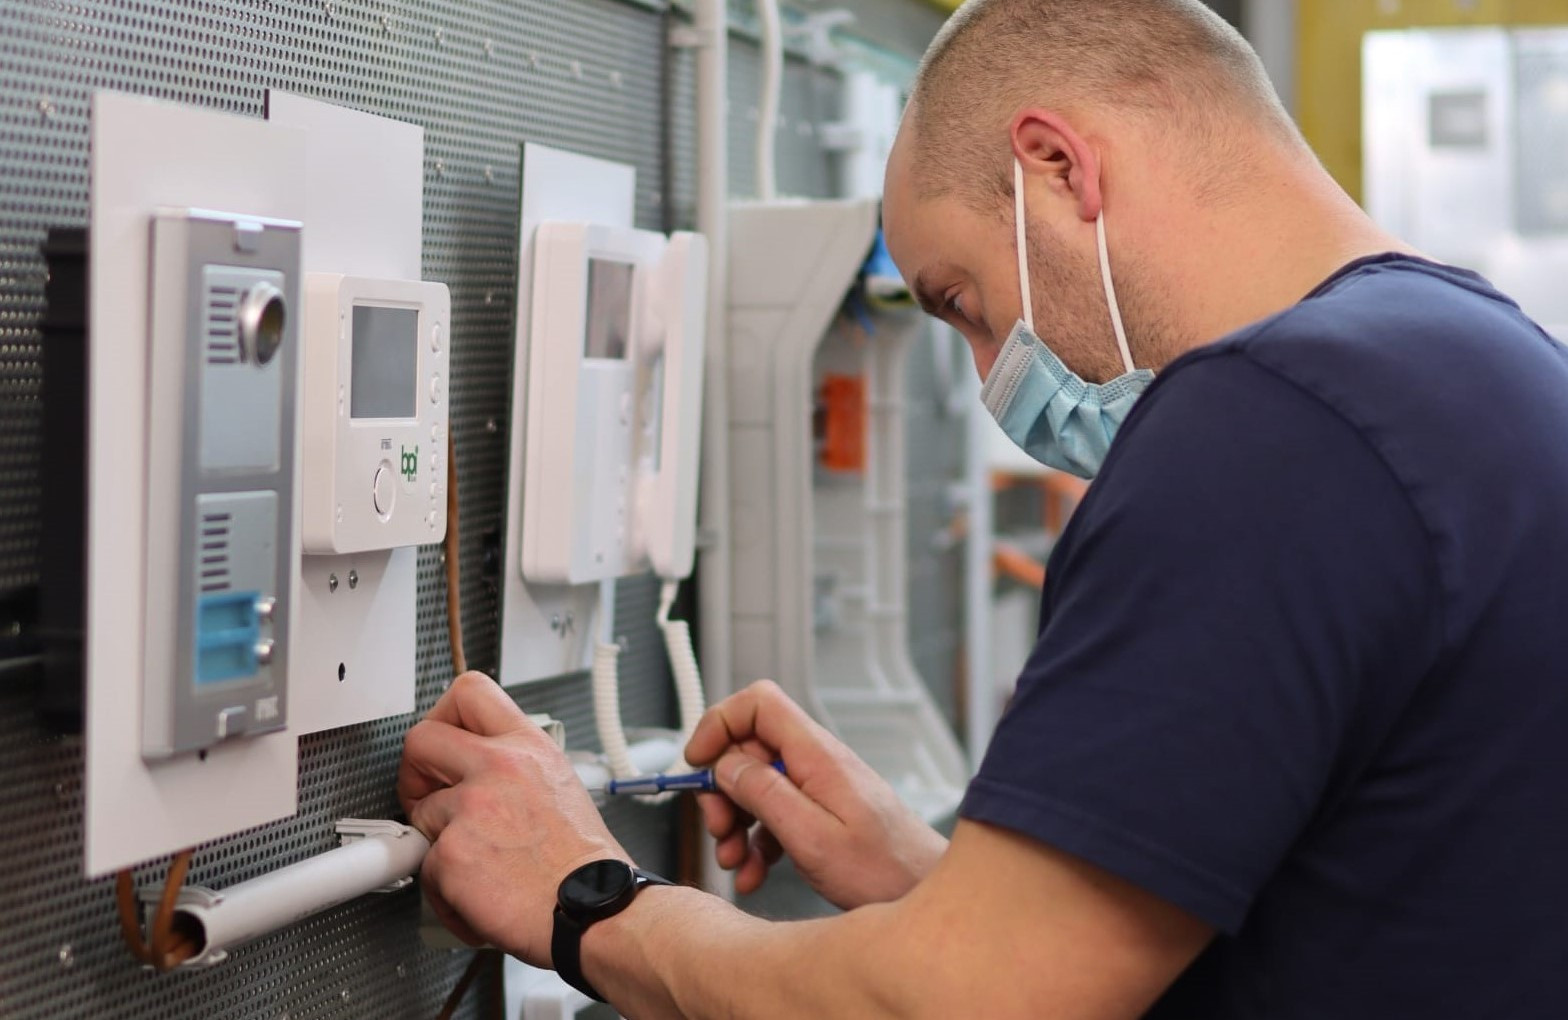 Teilnehmer der Elektrotechnik-Fortbildung